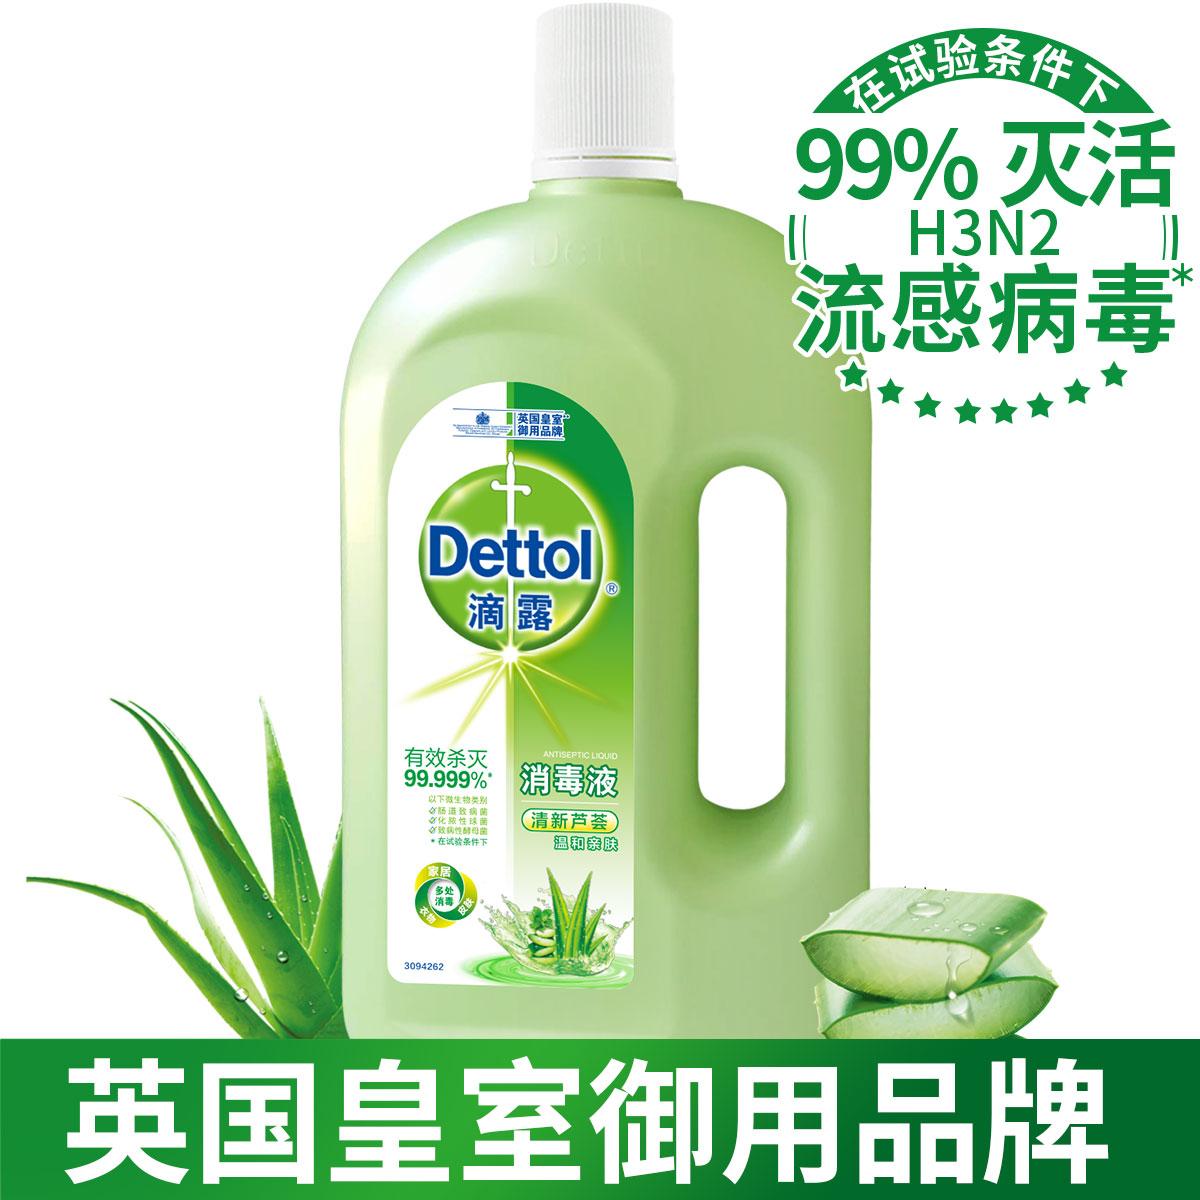 Dettol 【杀菌99.999%】滴露新品消毒液 芦荟精华温和亲肤 高效除螨1L